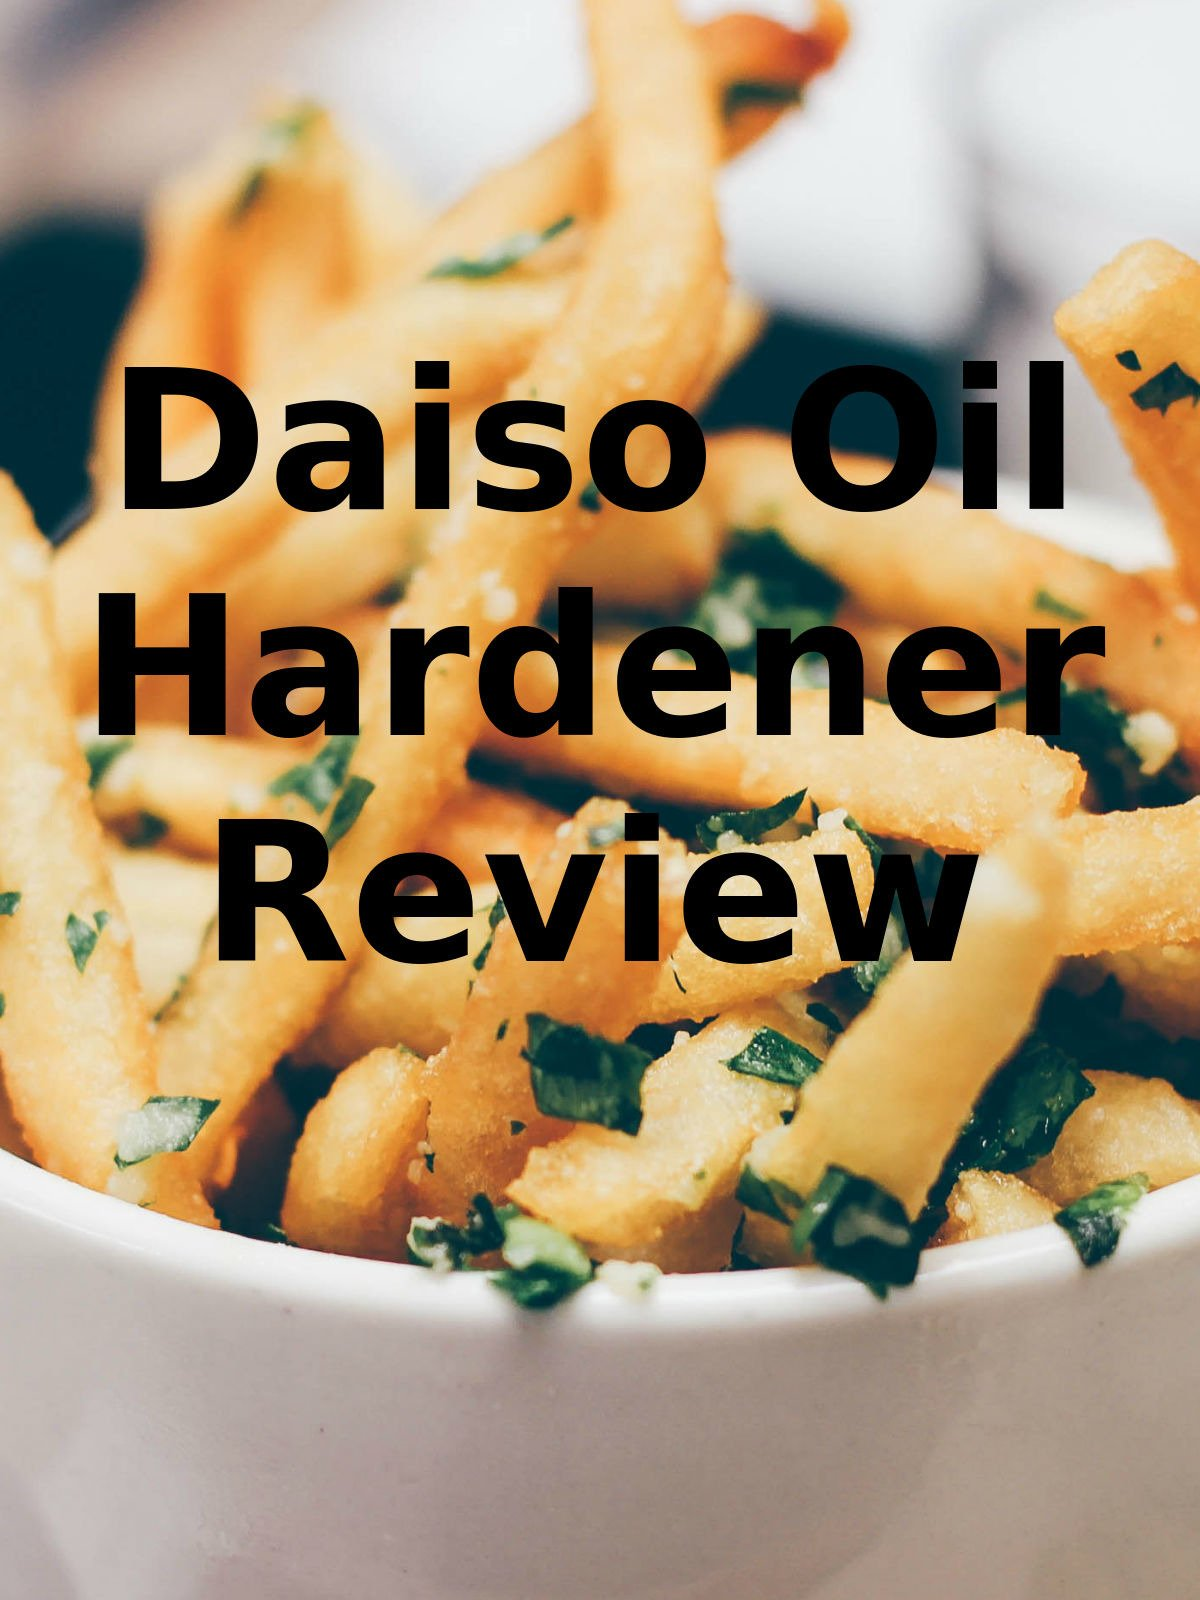 Review: Daiso Oil Hardener Review